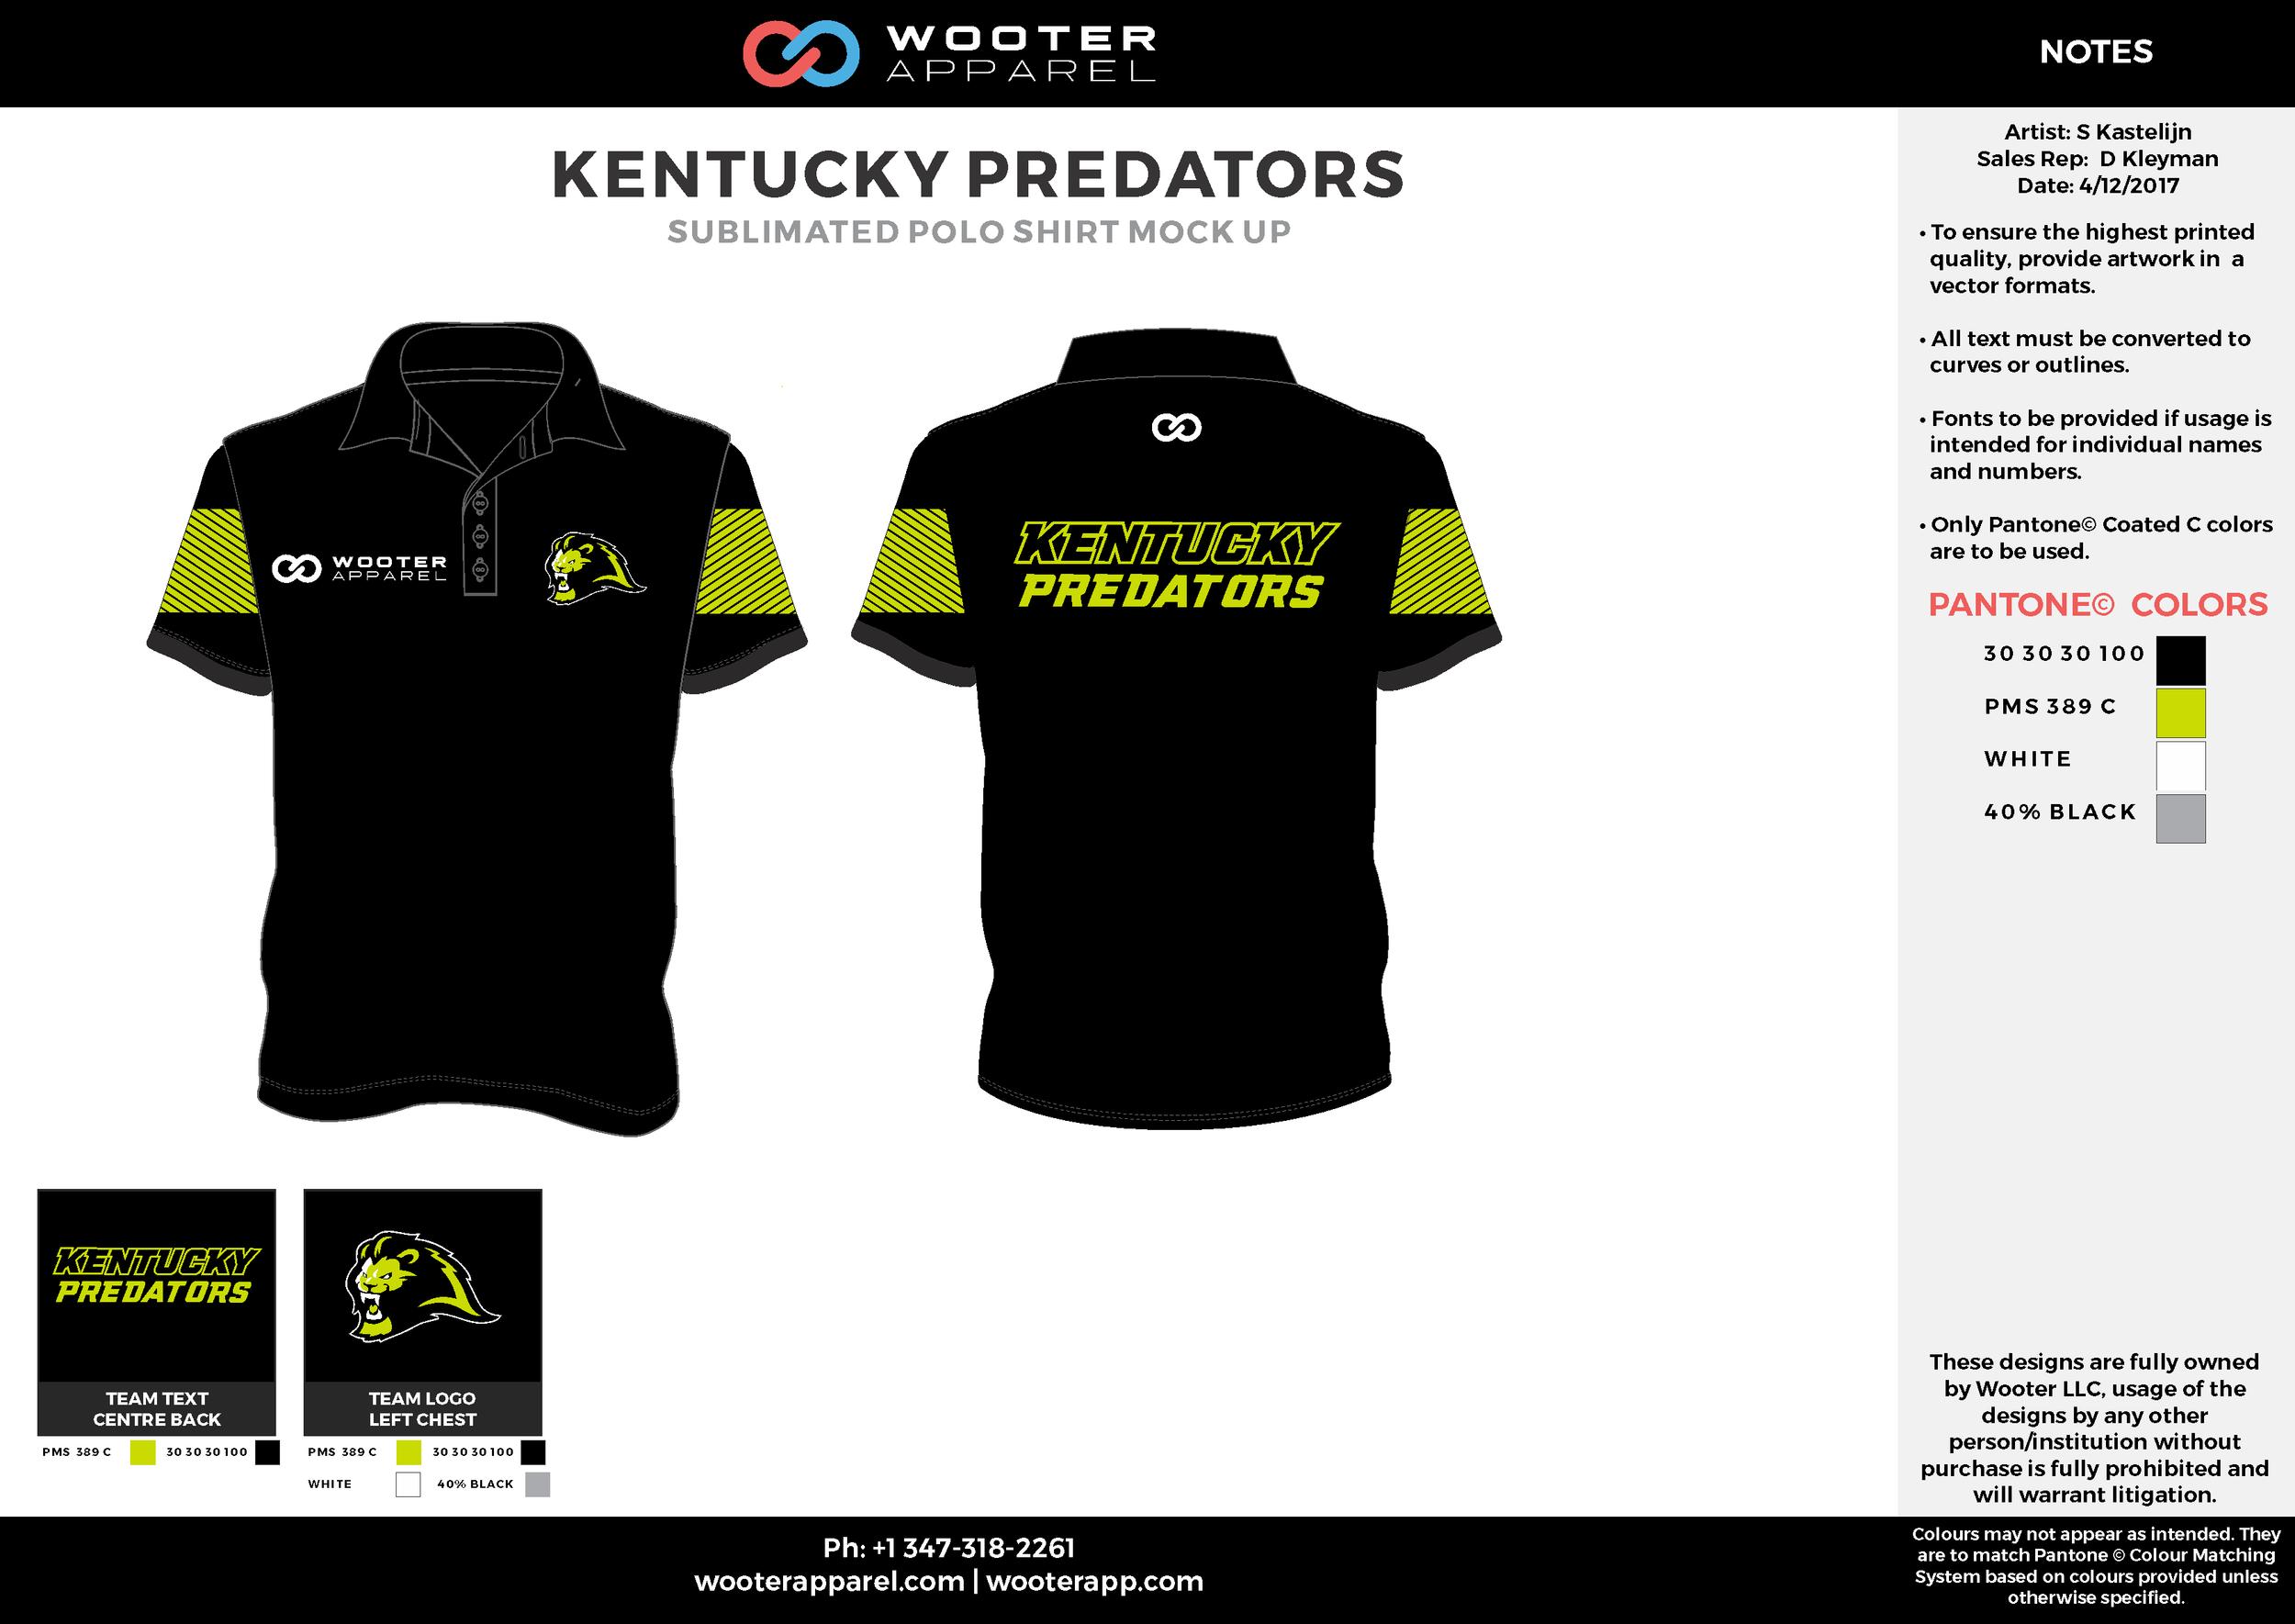 KENTUCKY PREDATORS black green gray white Polo Shirts